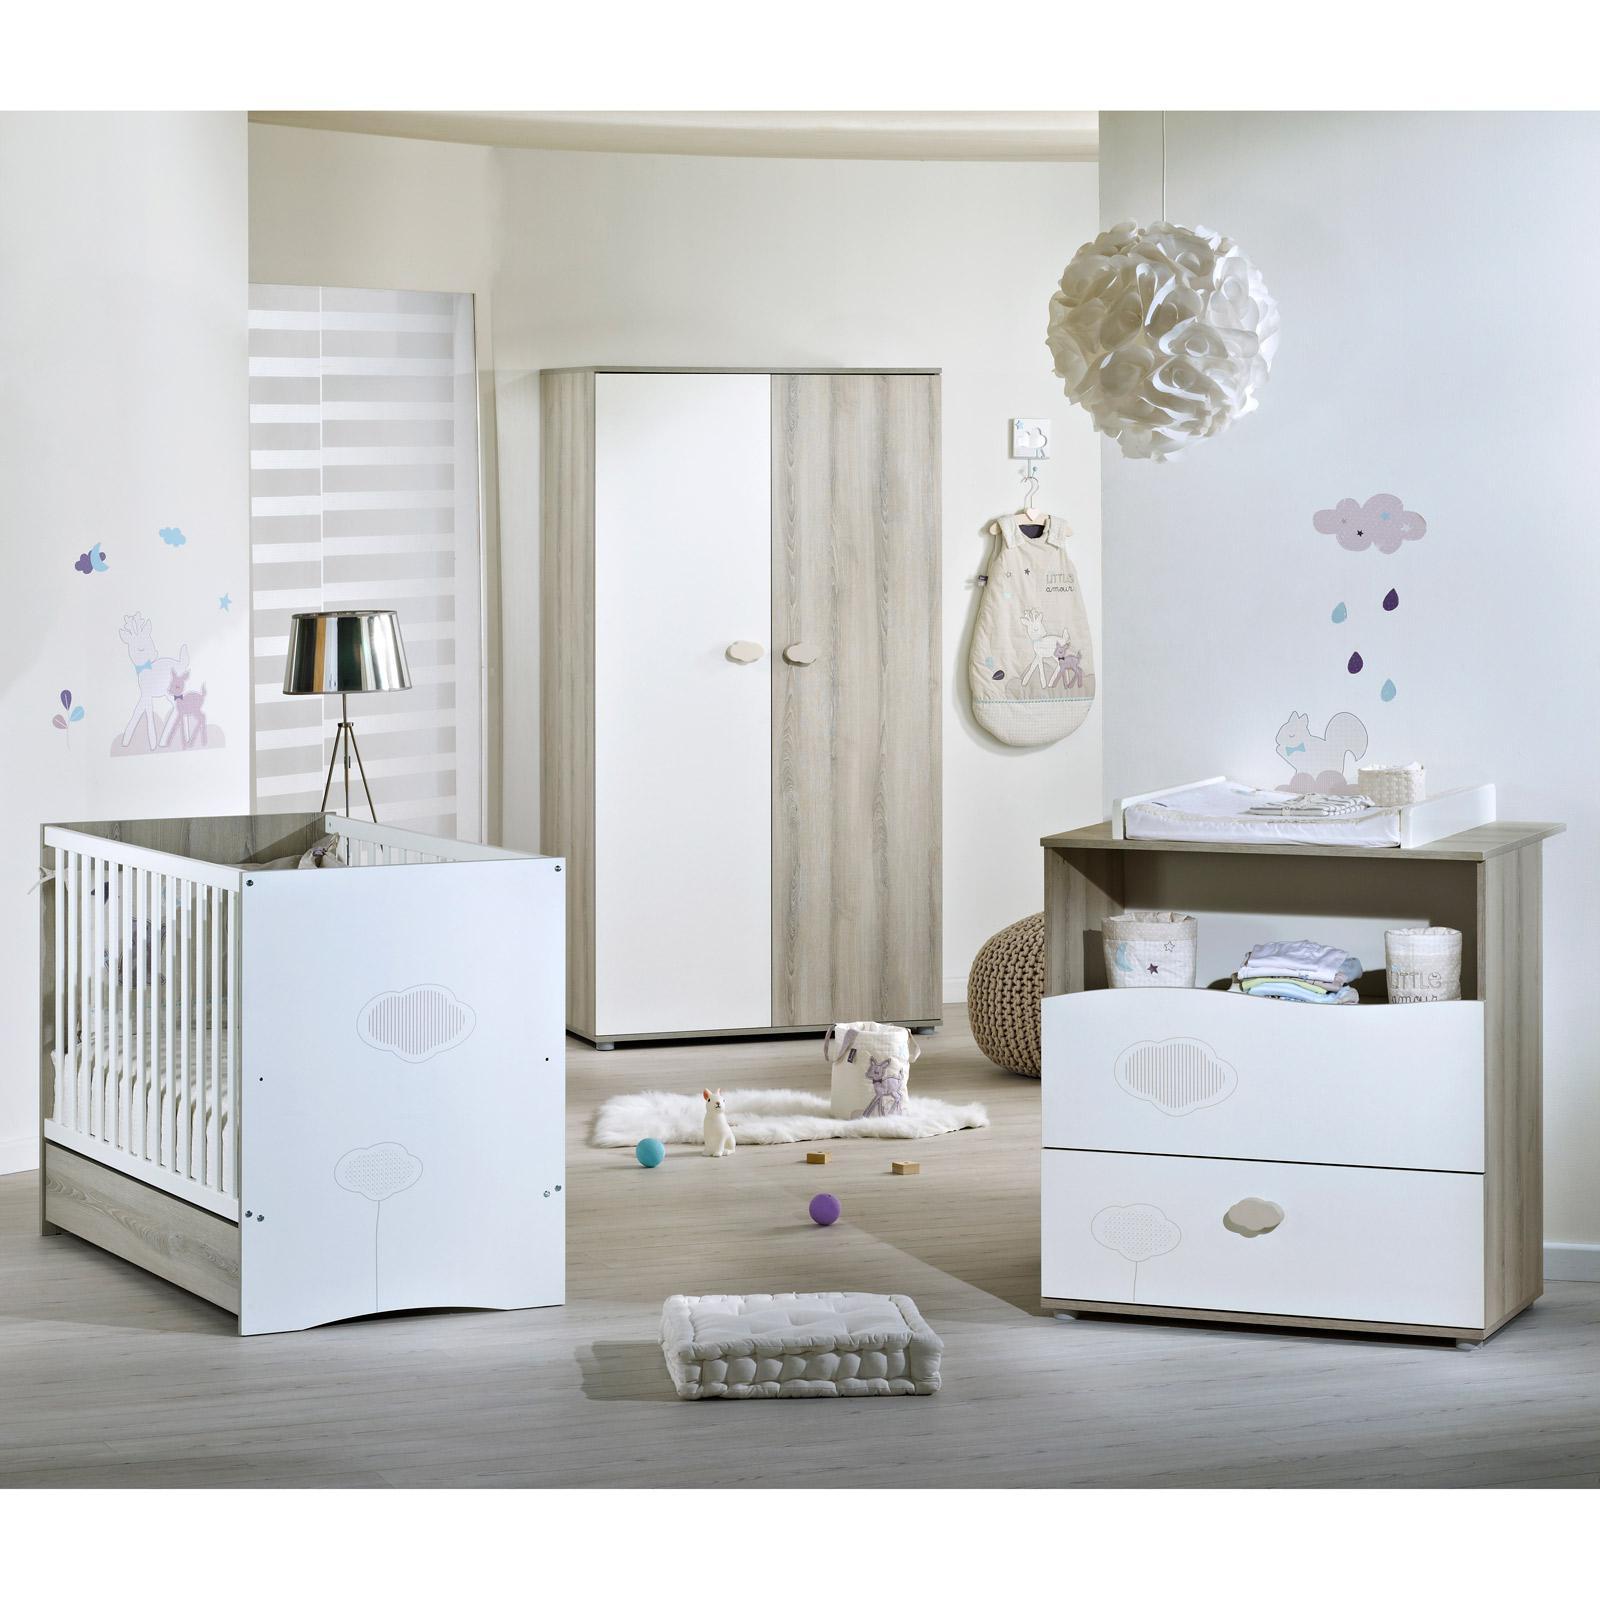 Lit bébé évolutif Na l Little Big Bed avec son tiroir 70 x